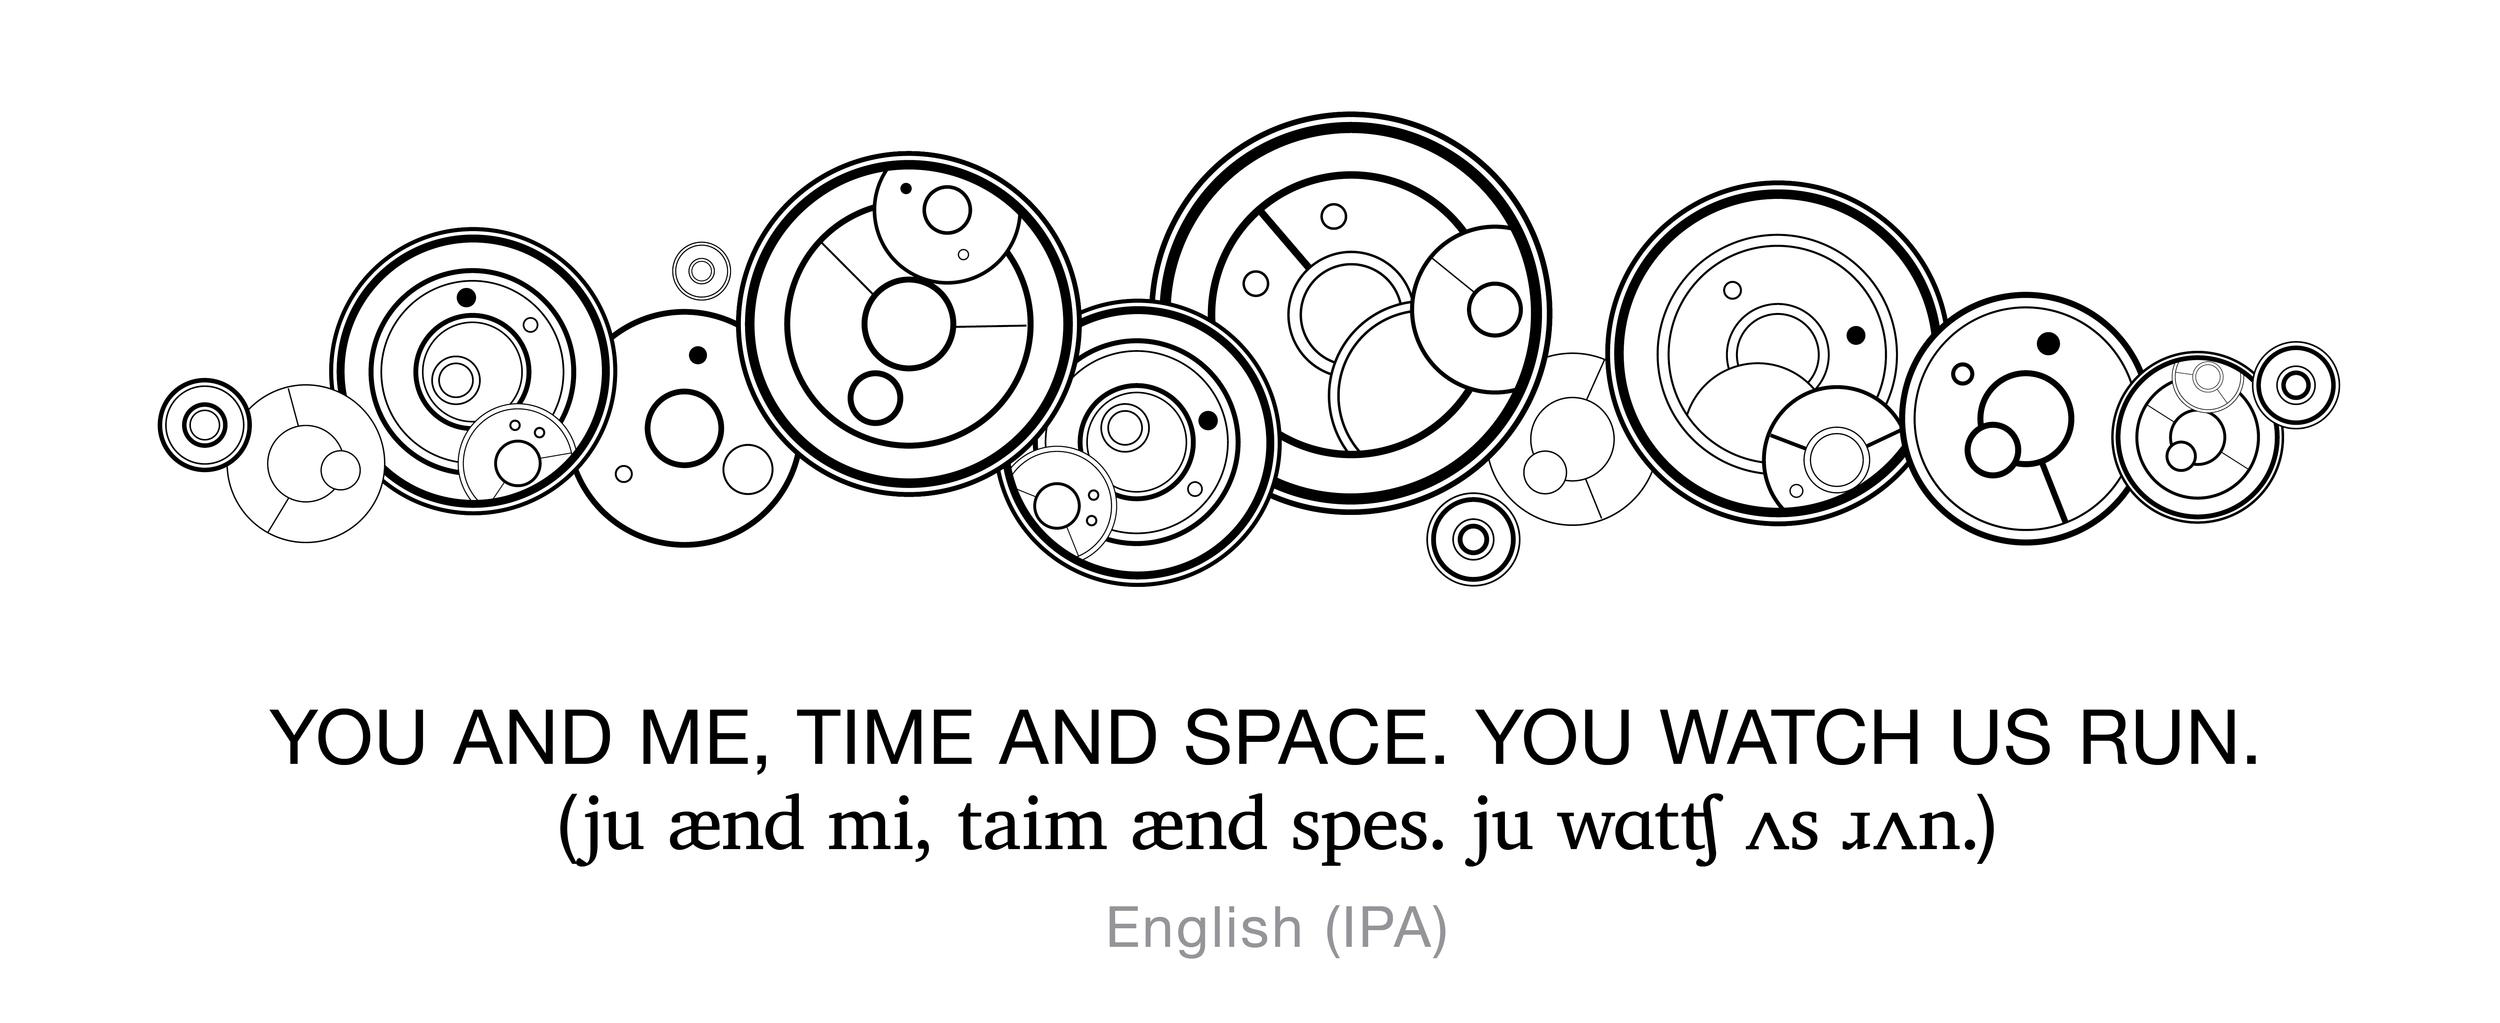 YouAndMeTimeAndSpace.YouWatchUsRun-02.png